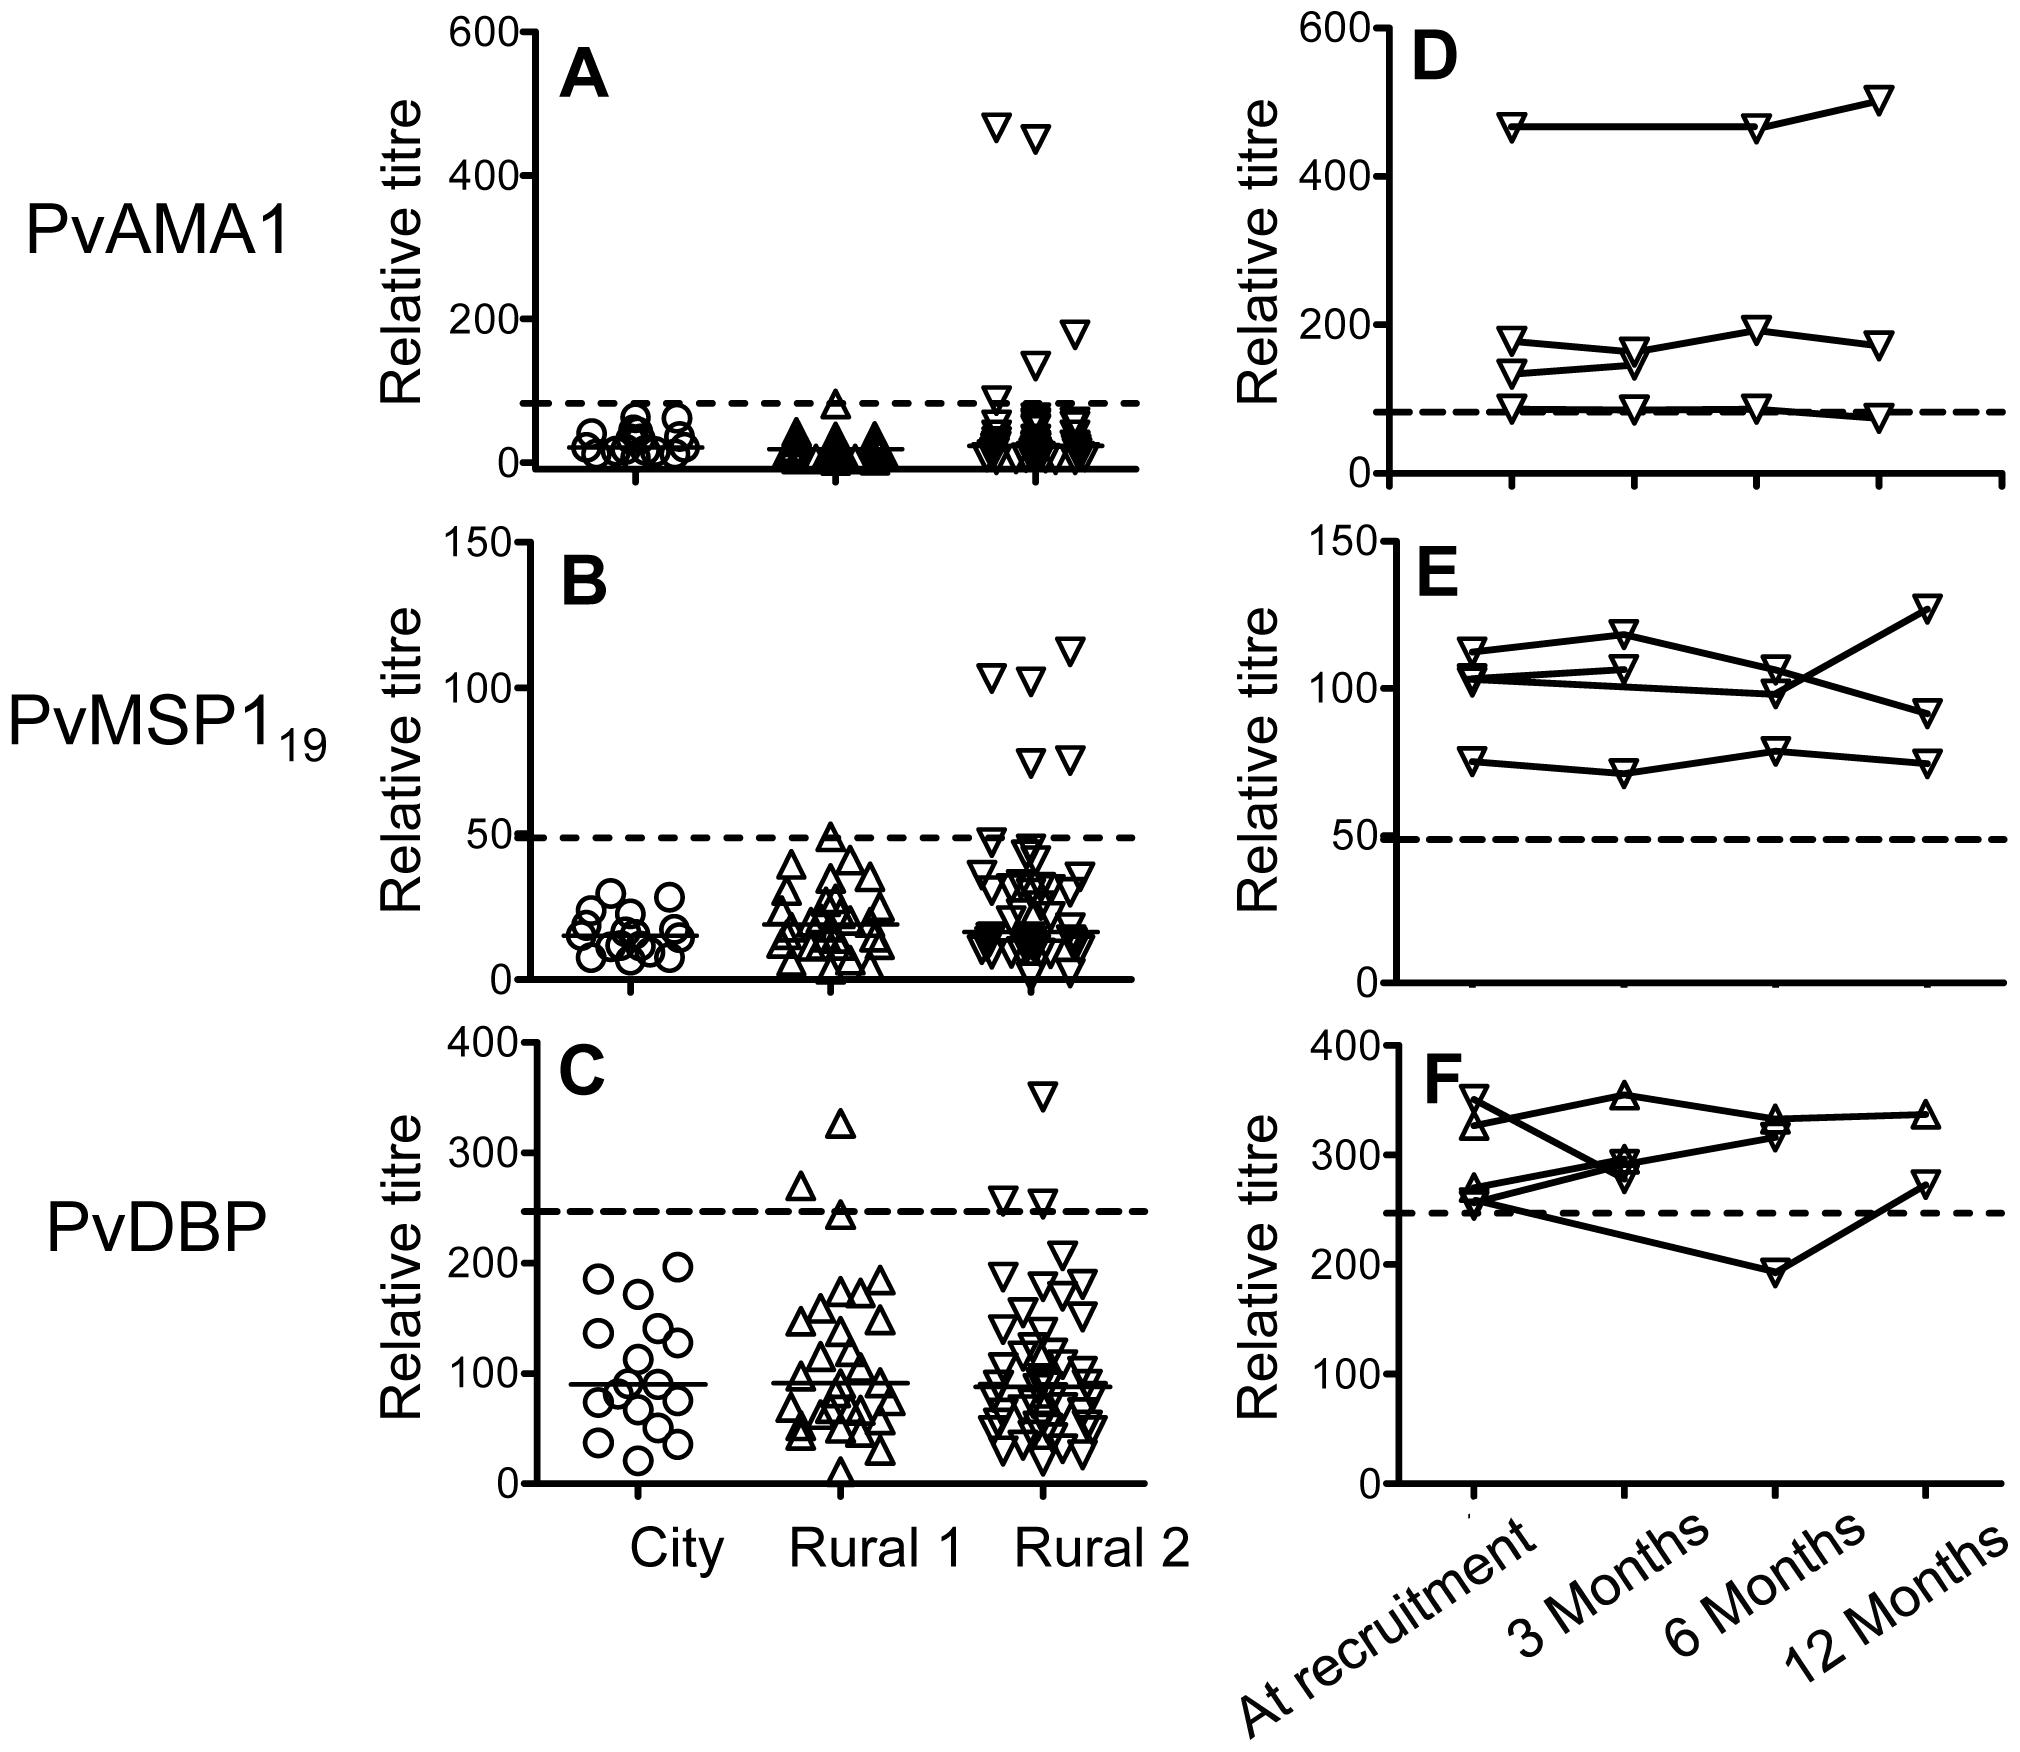 Antibody responses to <i>P. vivax</i> antigens.